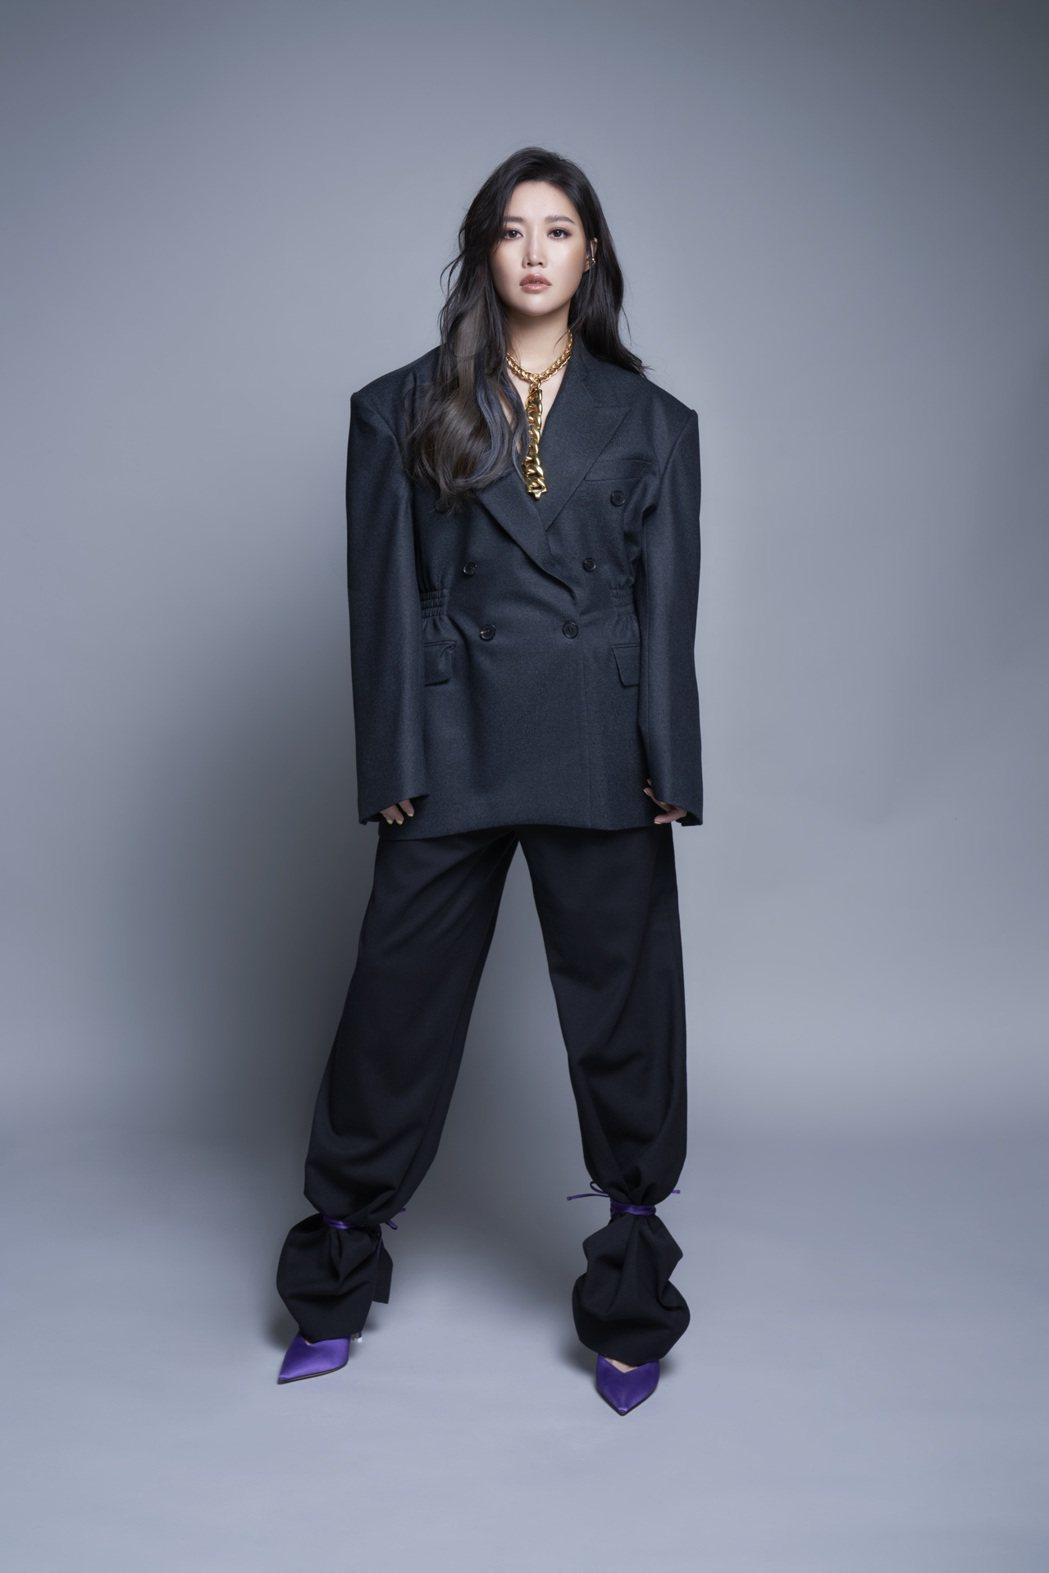 A-Lin將於12月在高雄巨蛋連辦2場「Passenger 旅.課」演唱會。圖/